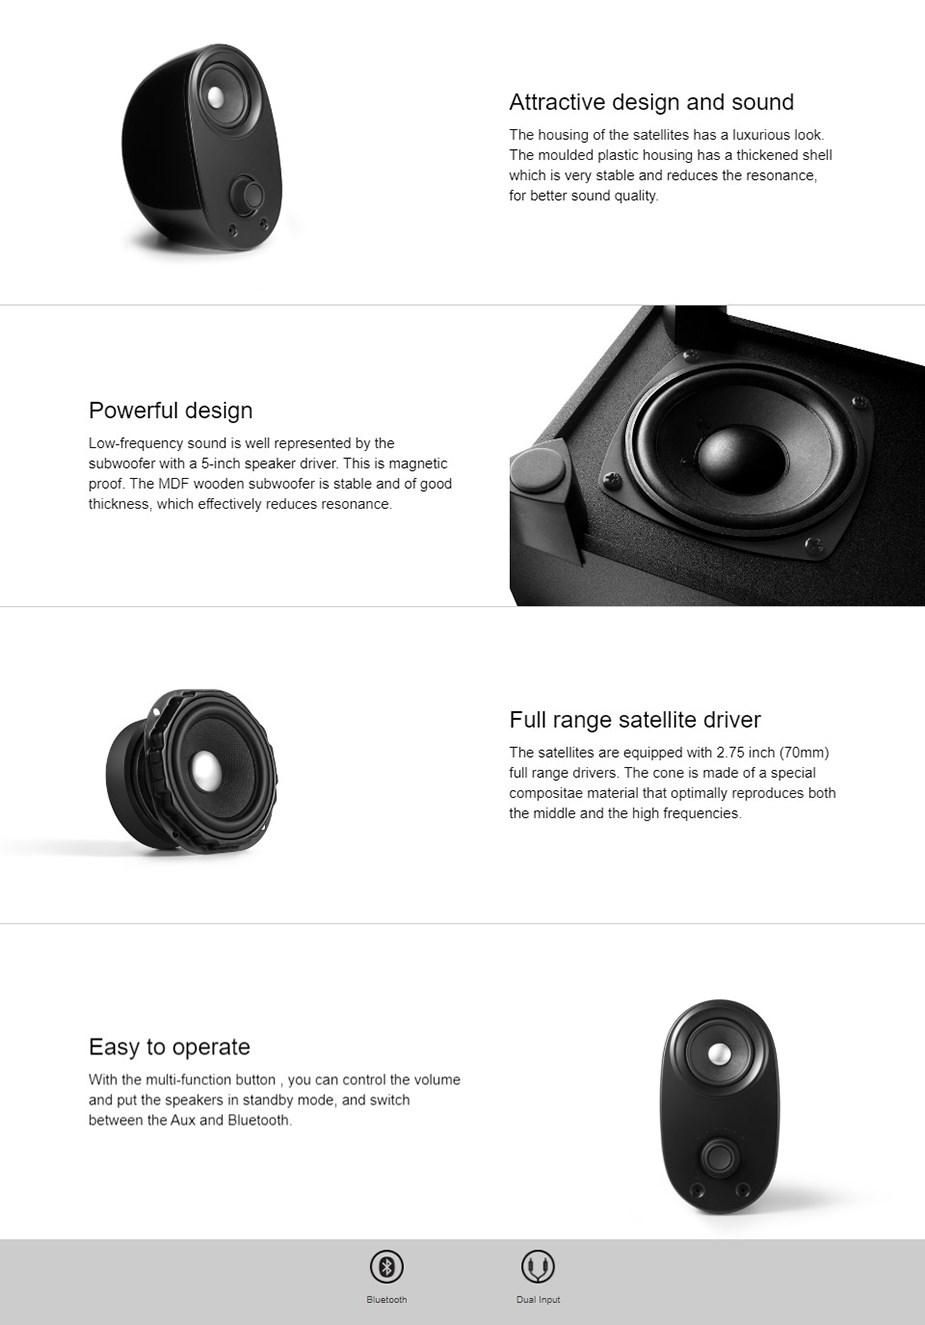 Edifier M1390BT 2.1 Bluetooth Multimedia Speakers - Desktop Overview 1